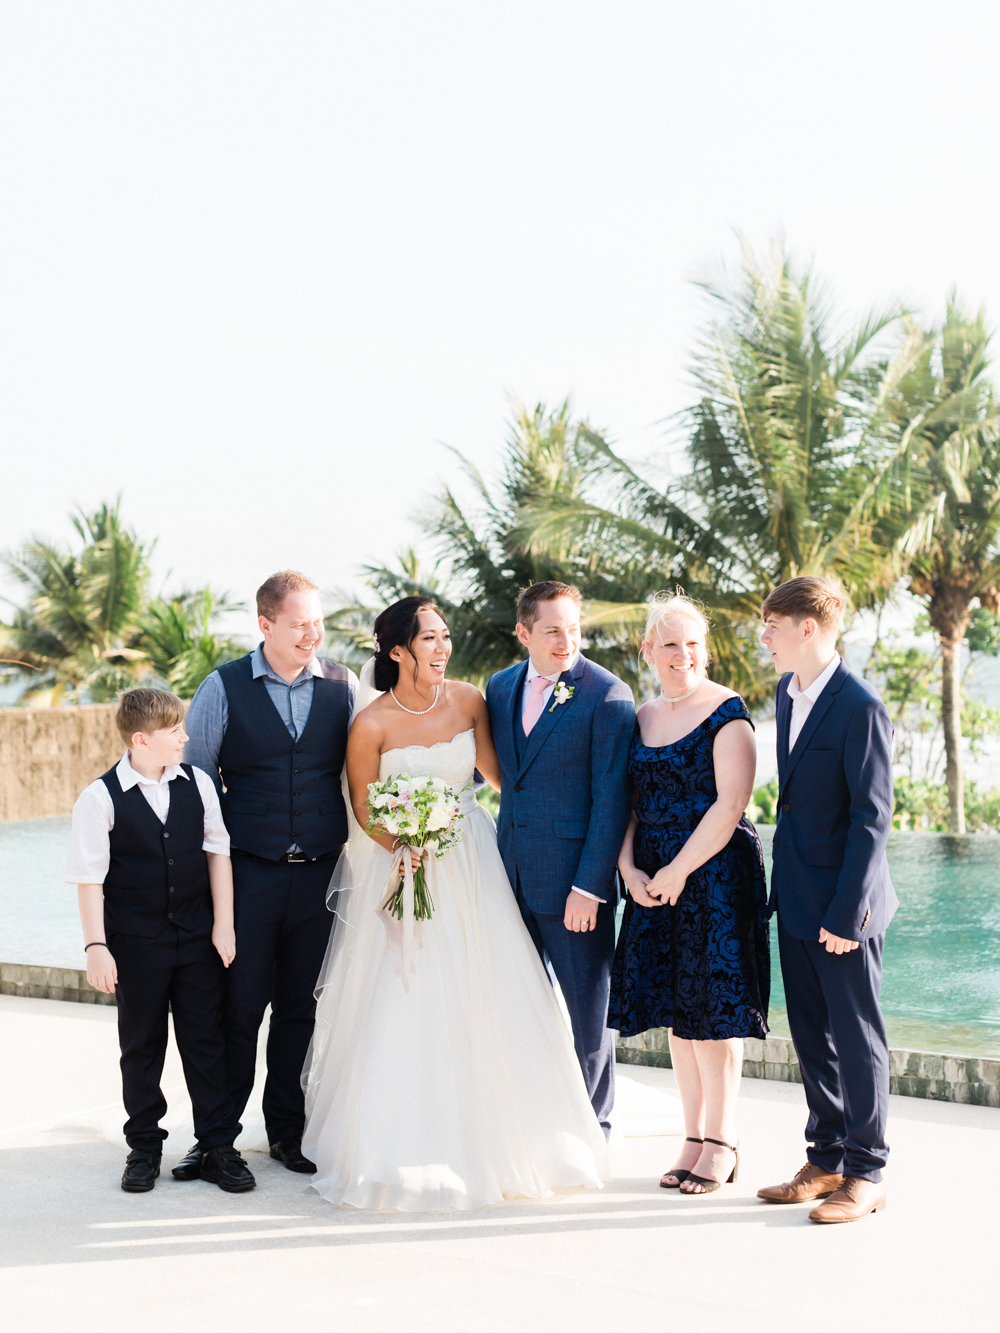 Bali_Real_Wedding_(c)_Rory_Wylie-83.jpg